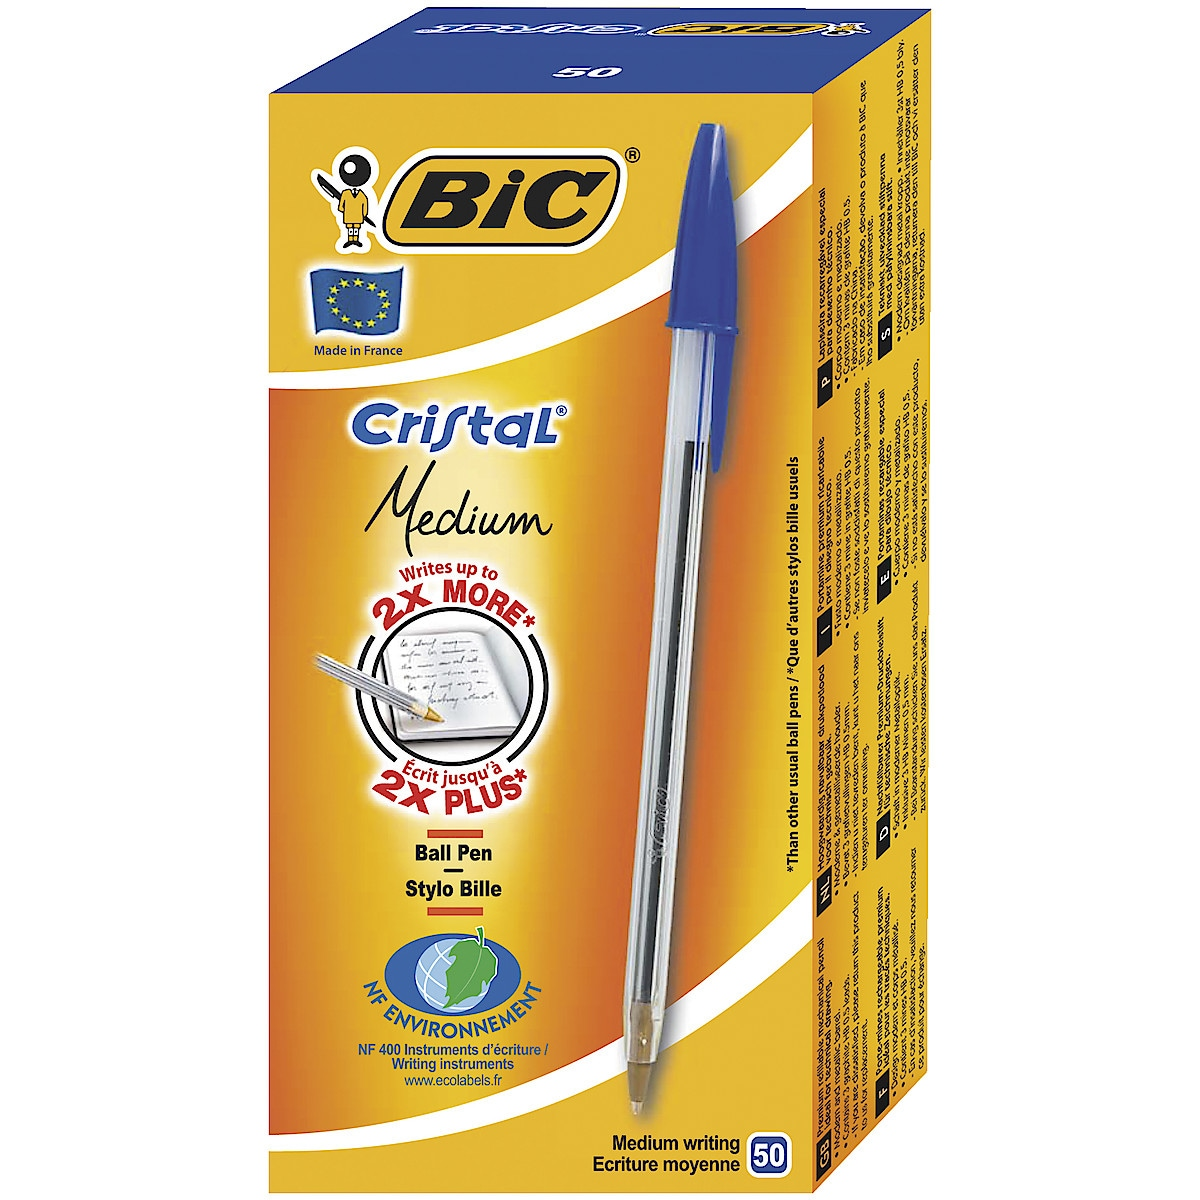 Kulspetspenna Bic Cristal Medium 50-pack